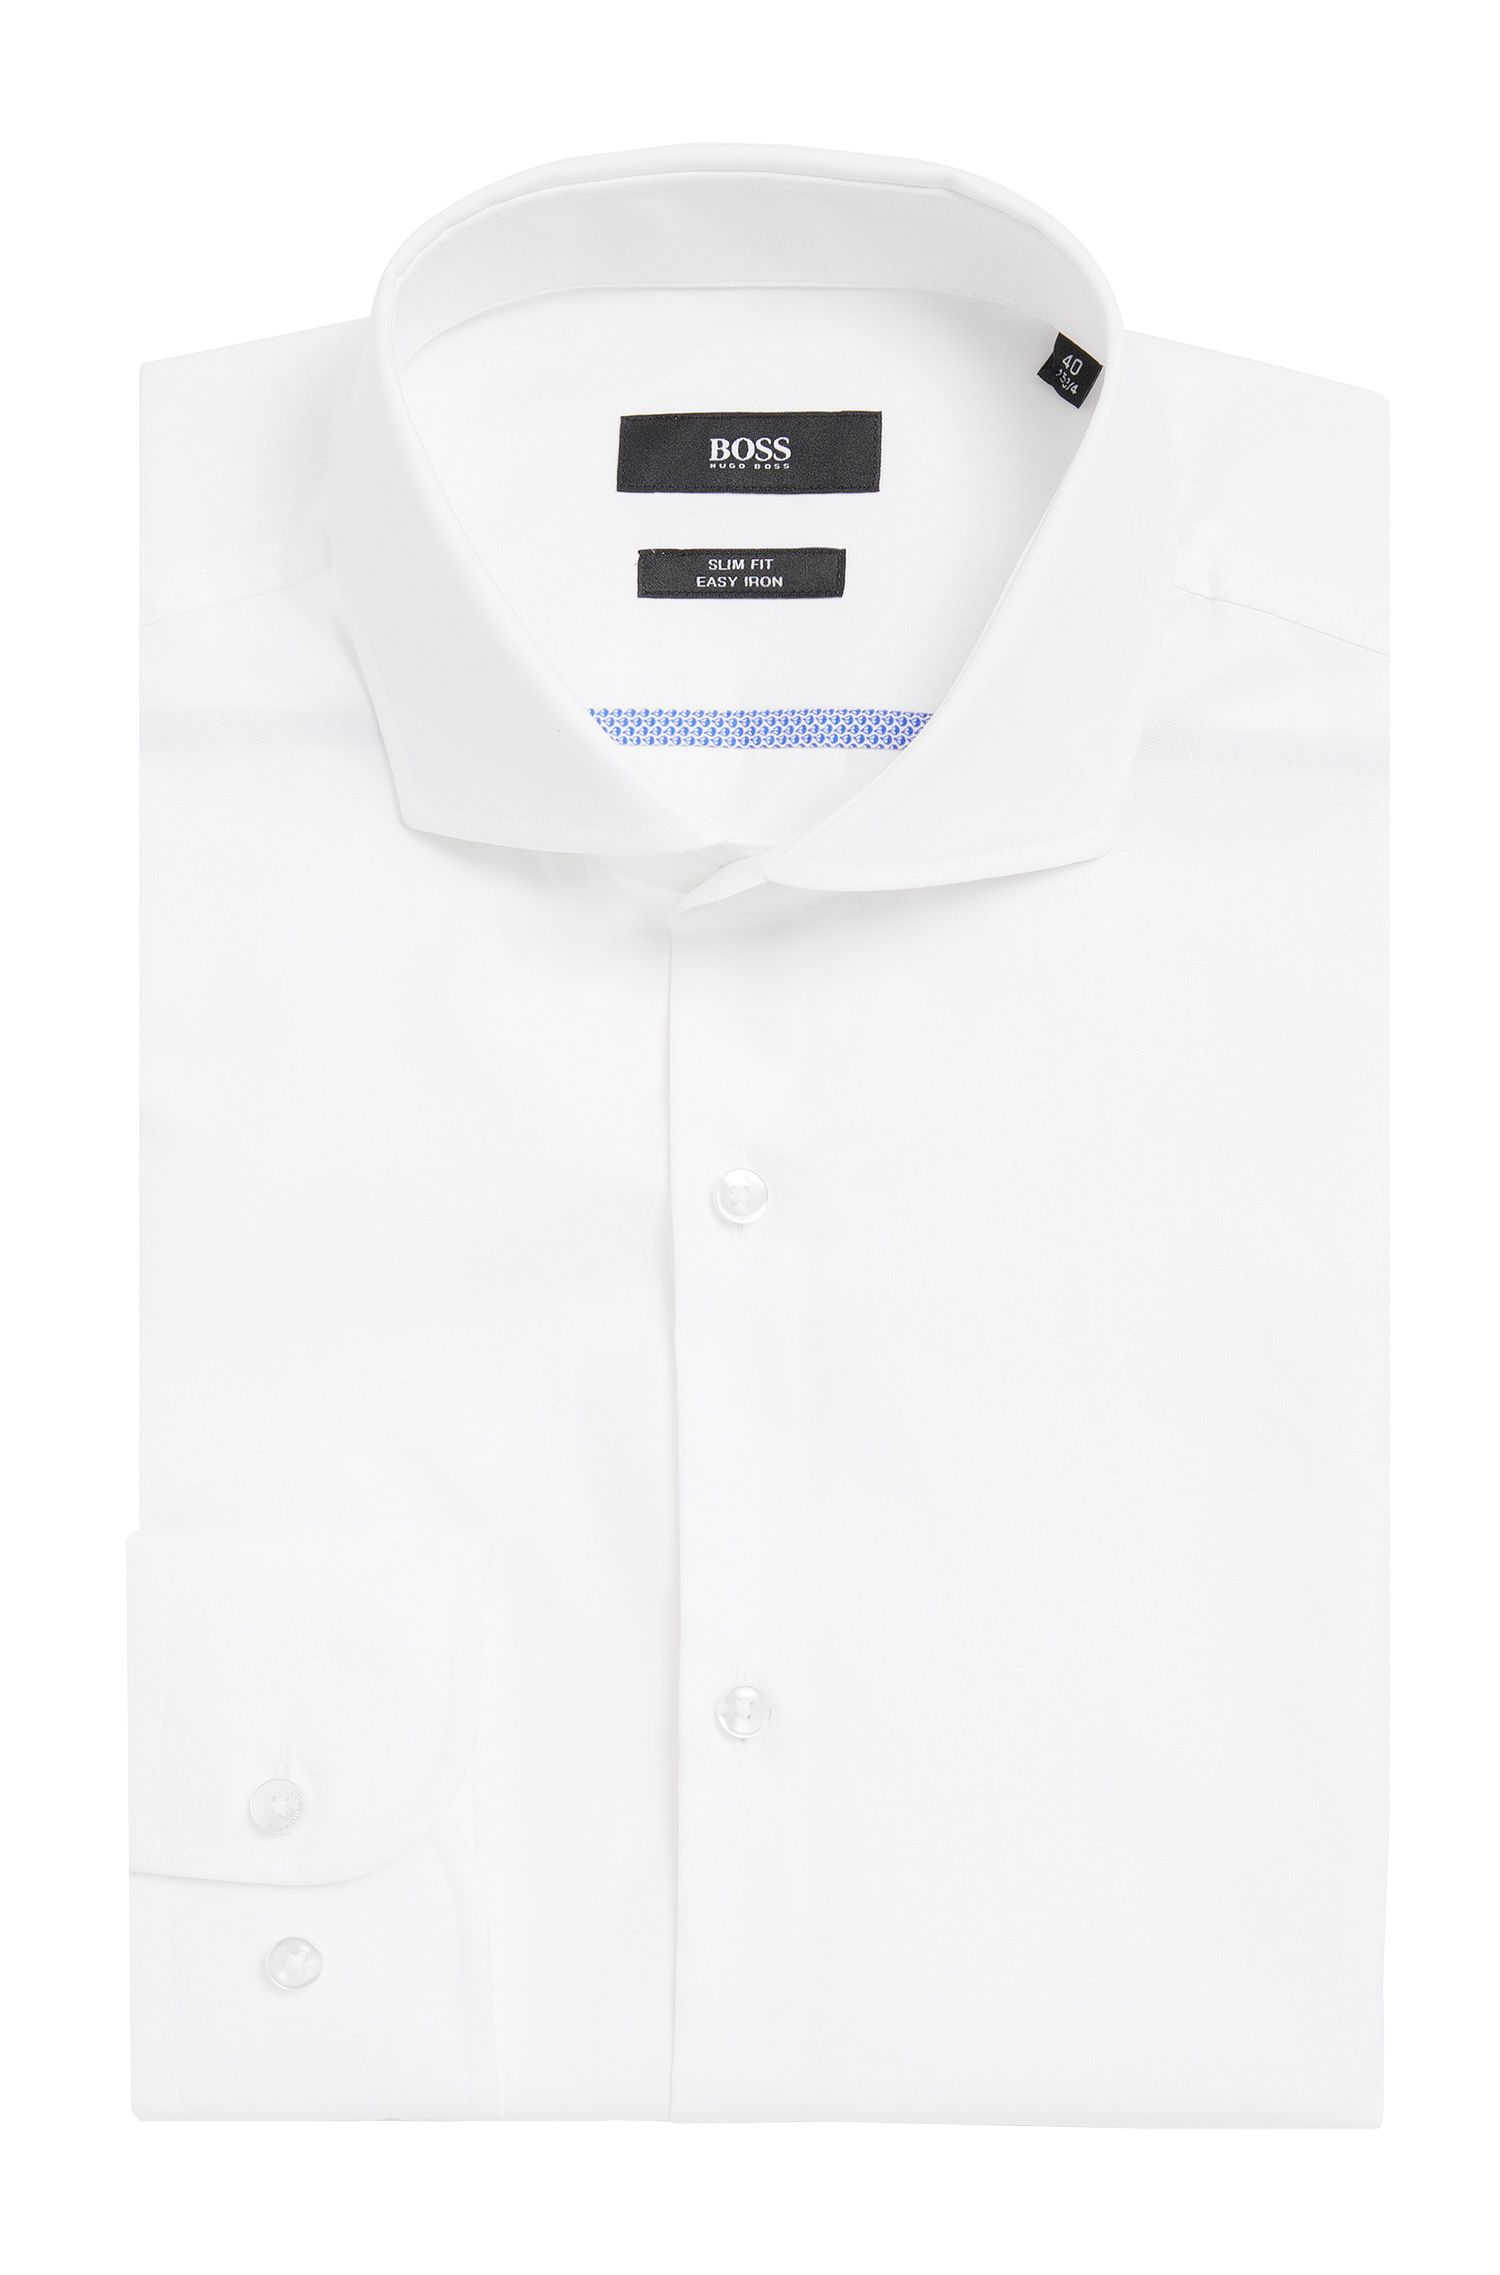 Easy-Iron Italian Cotton Dress Shirt, Slim Fit | Jerrin